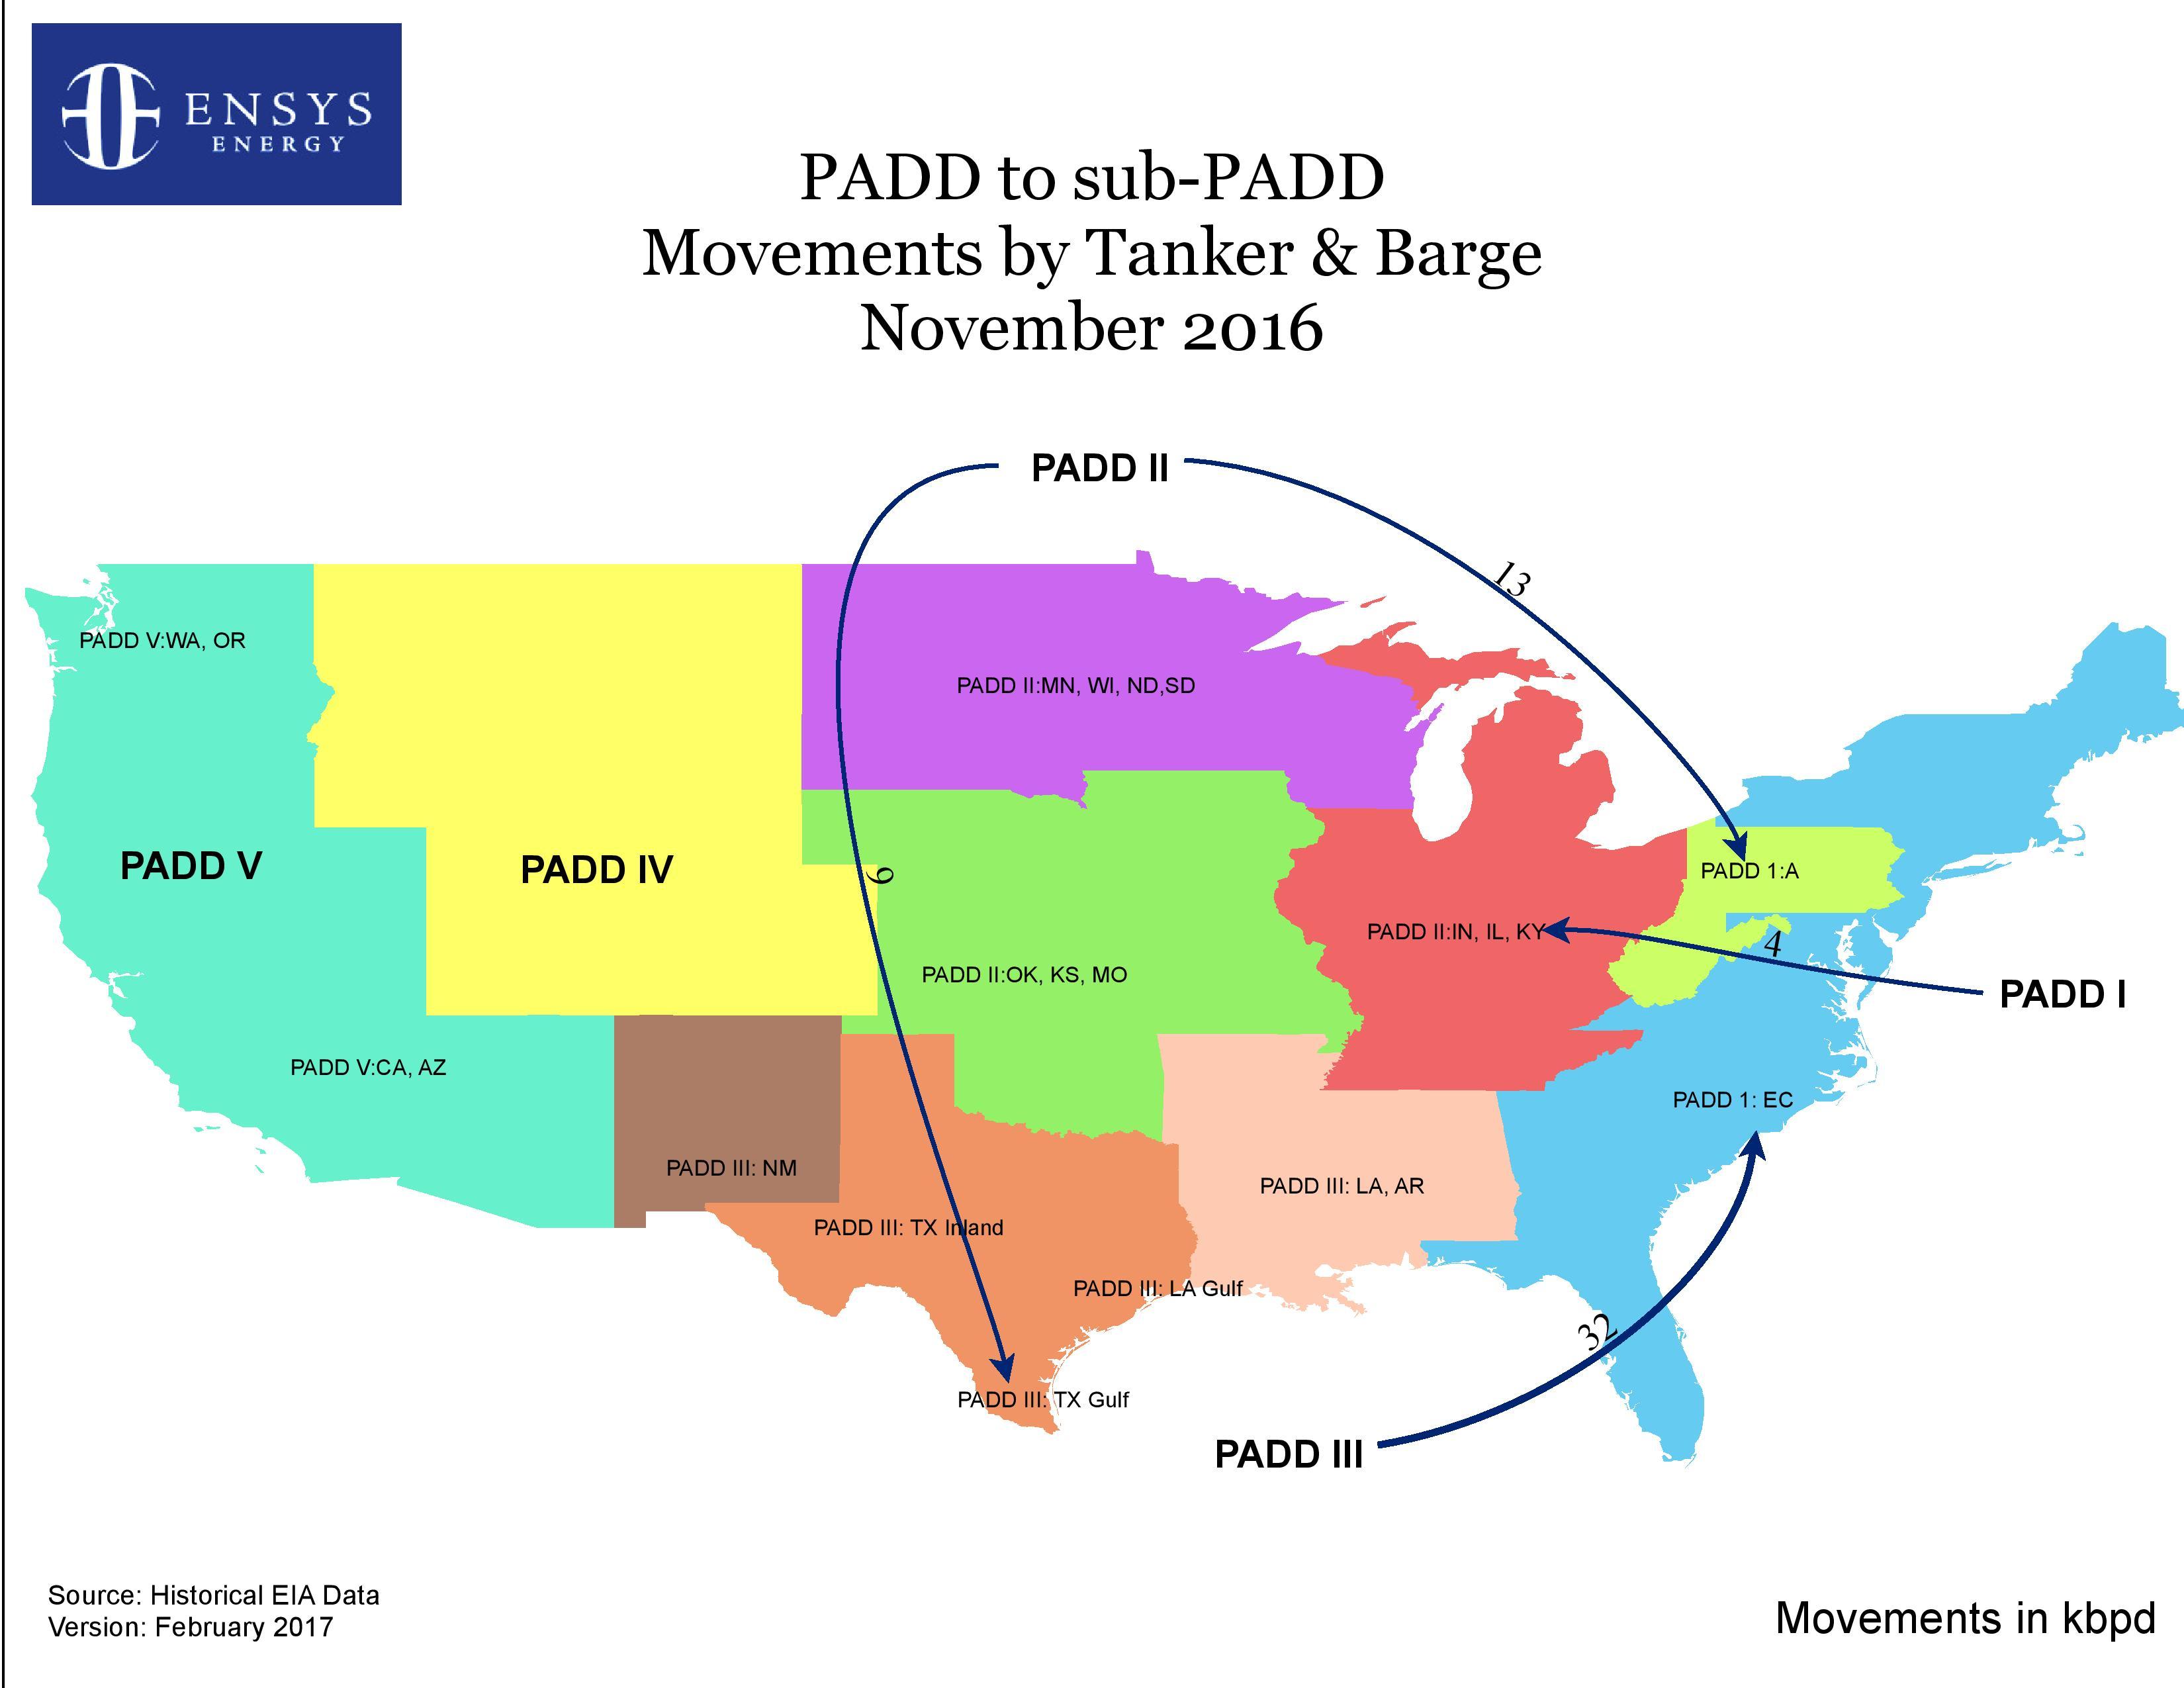 PADD-SUBPADD_Nov2016_Barge-page-001 (1)